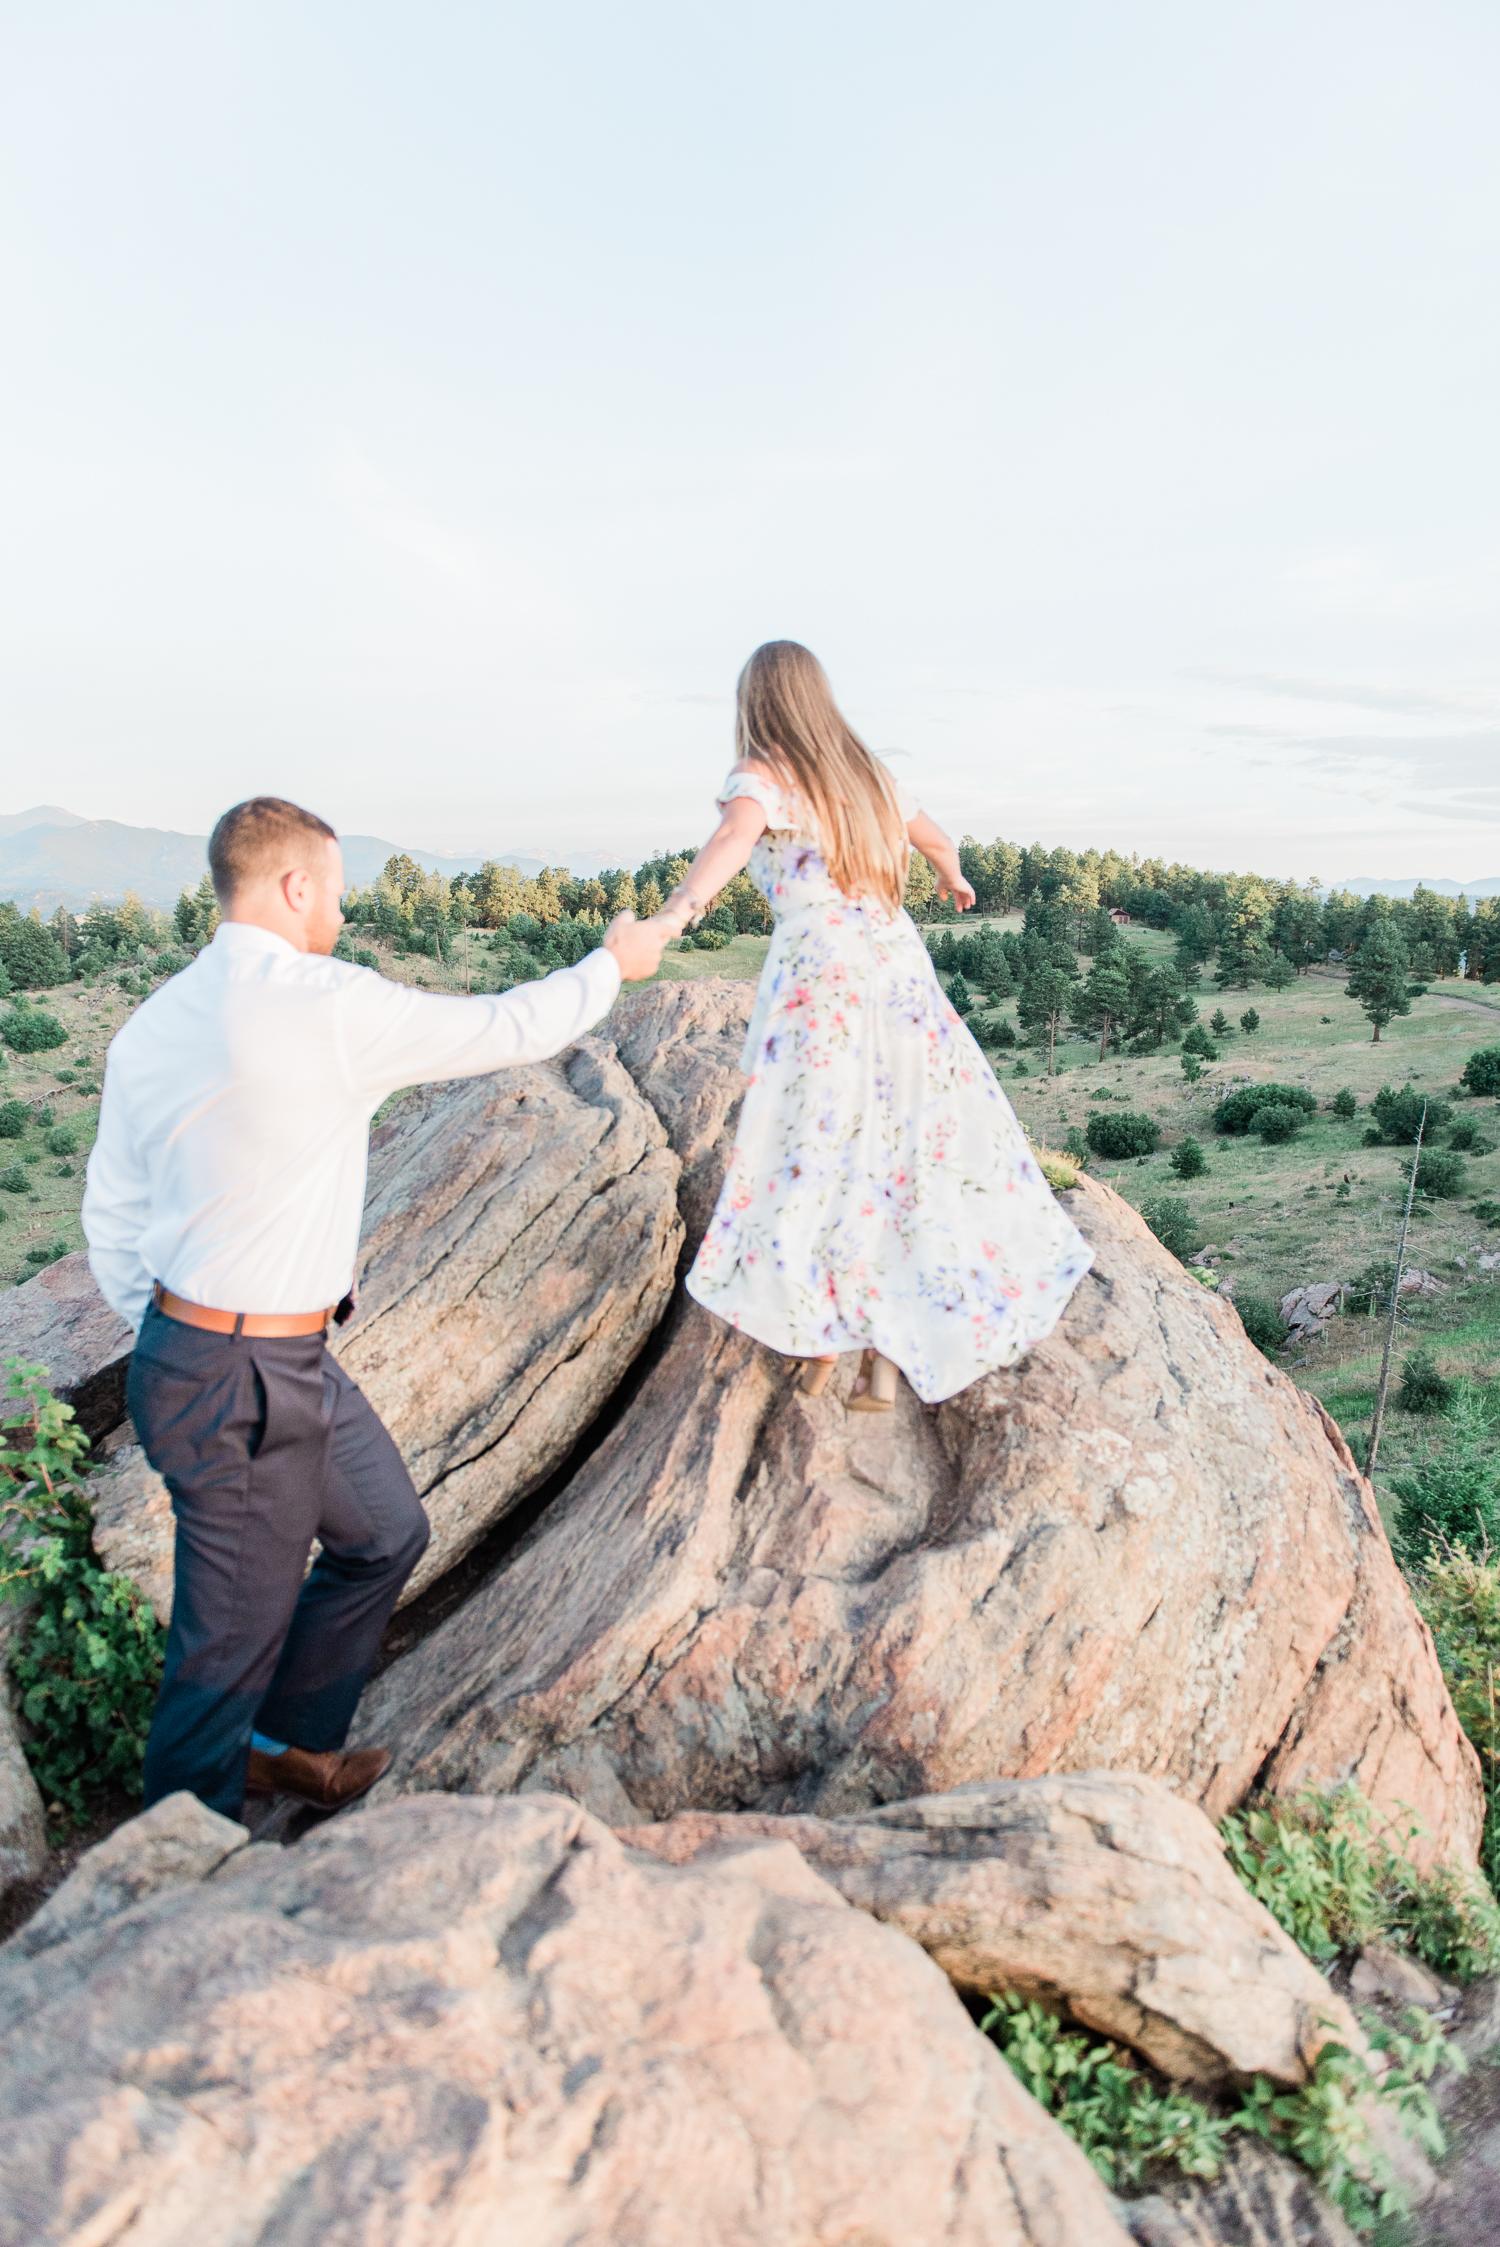 2019-08-30-Engagement-Morgan-Adam-MtFalcon-1202.jpg